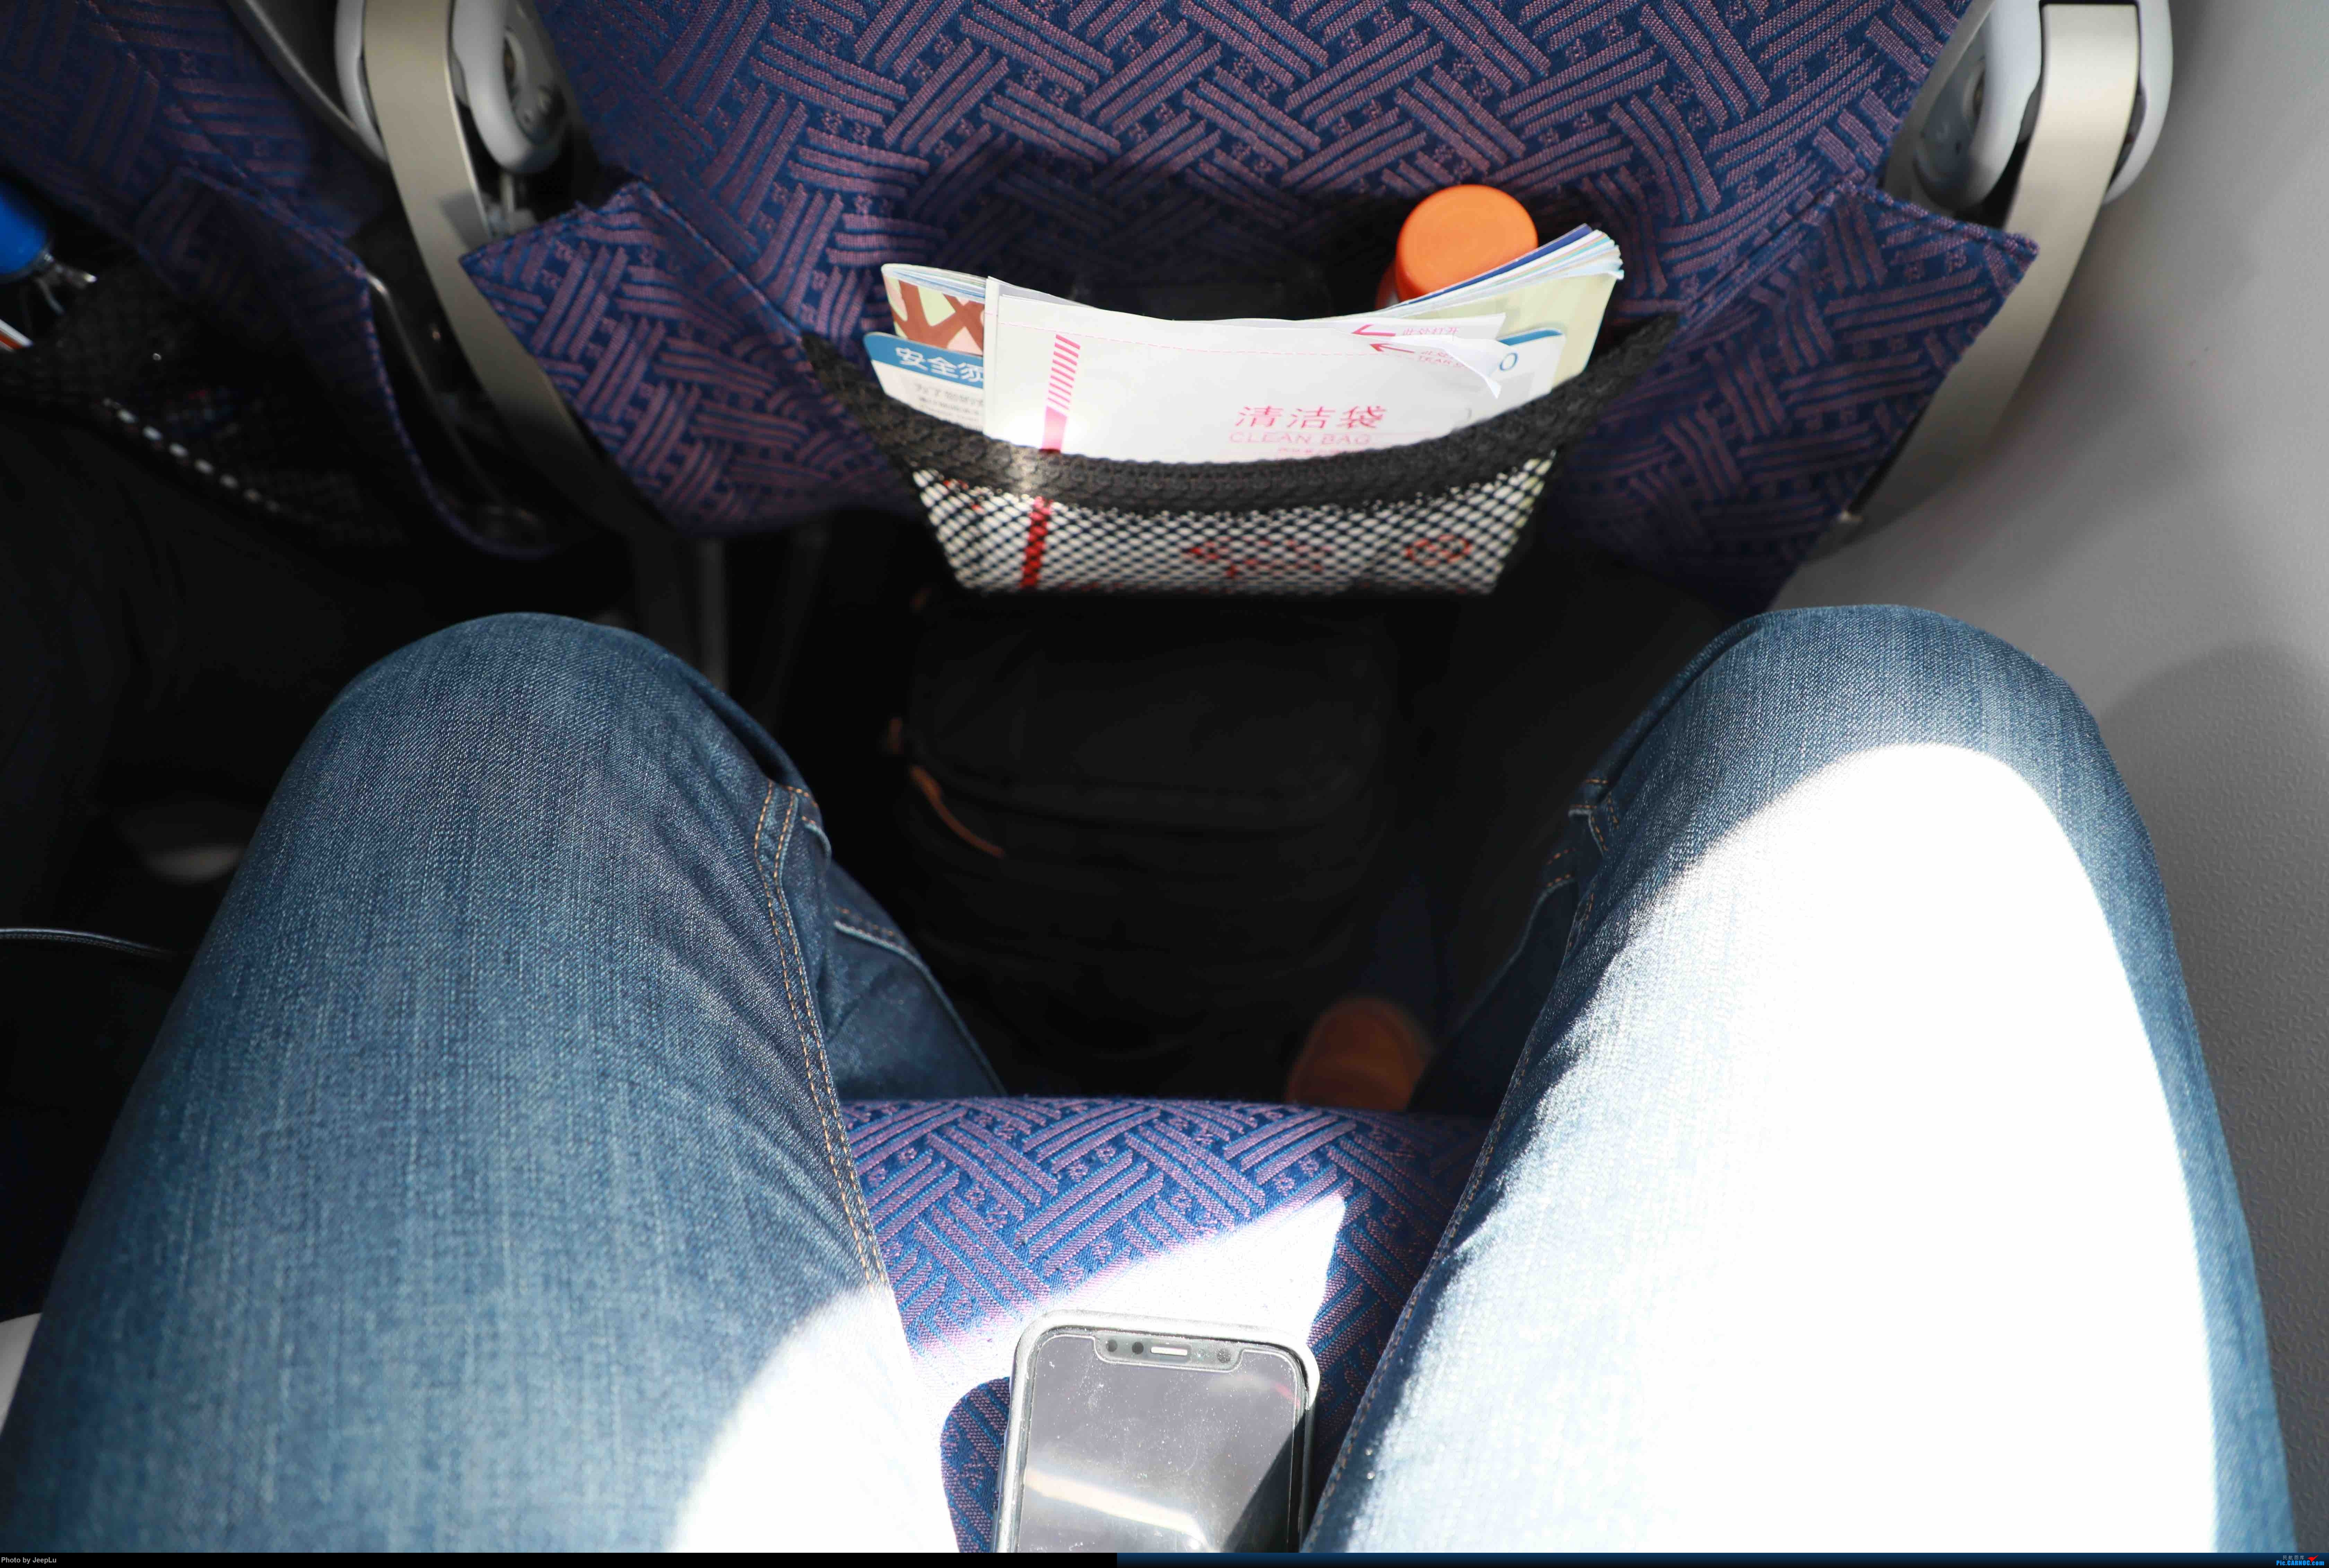 Re:[原创]佛山-东营-南苑,最后的南苑&PEK-CAN 擦航77W商务舱体验 737-800